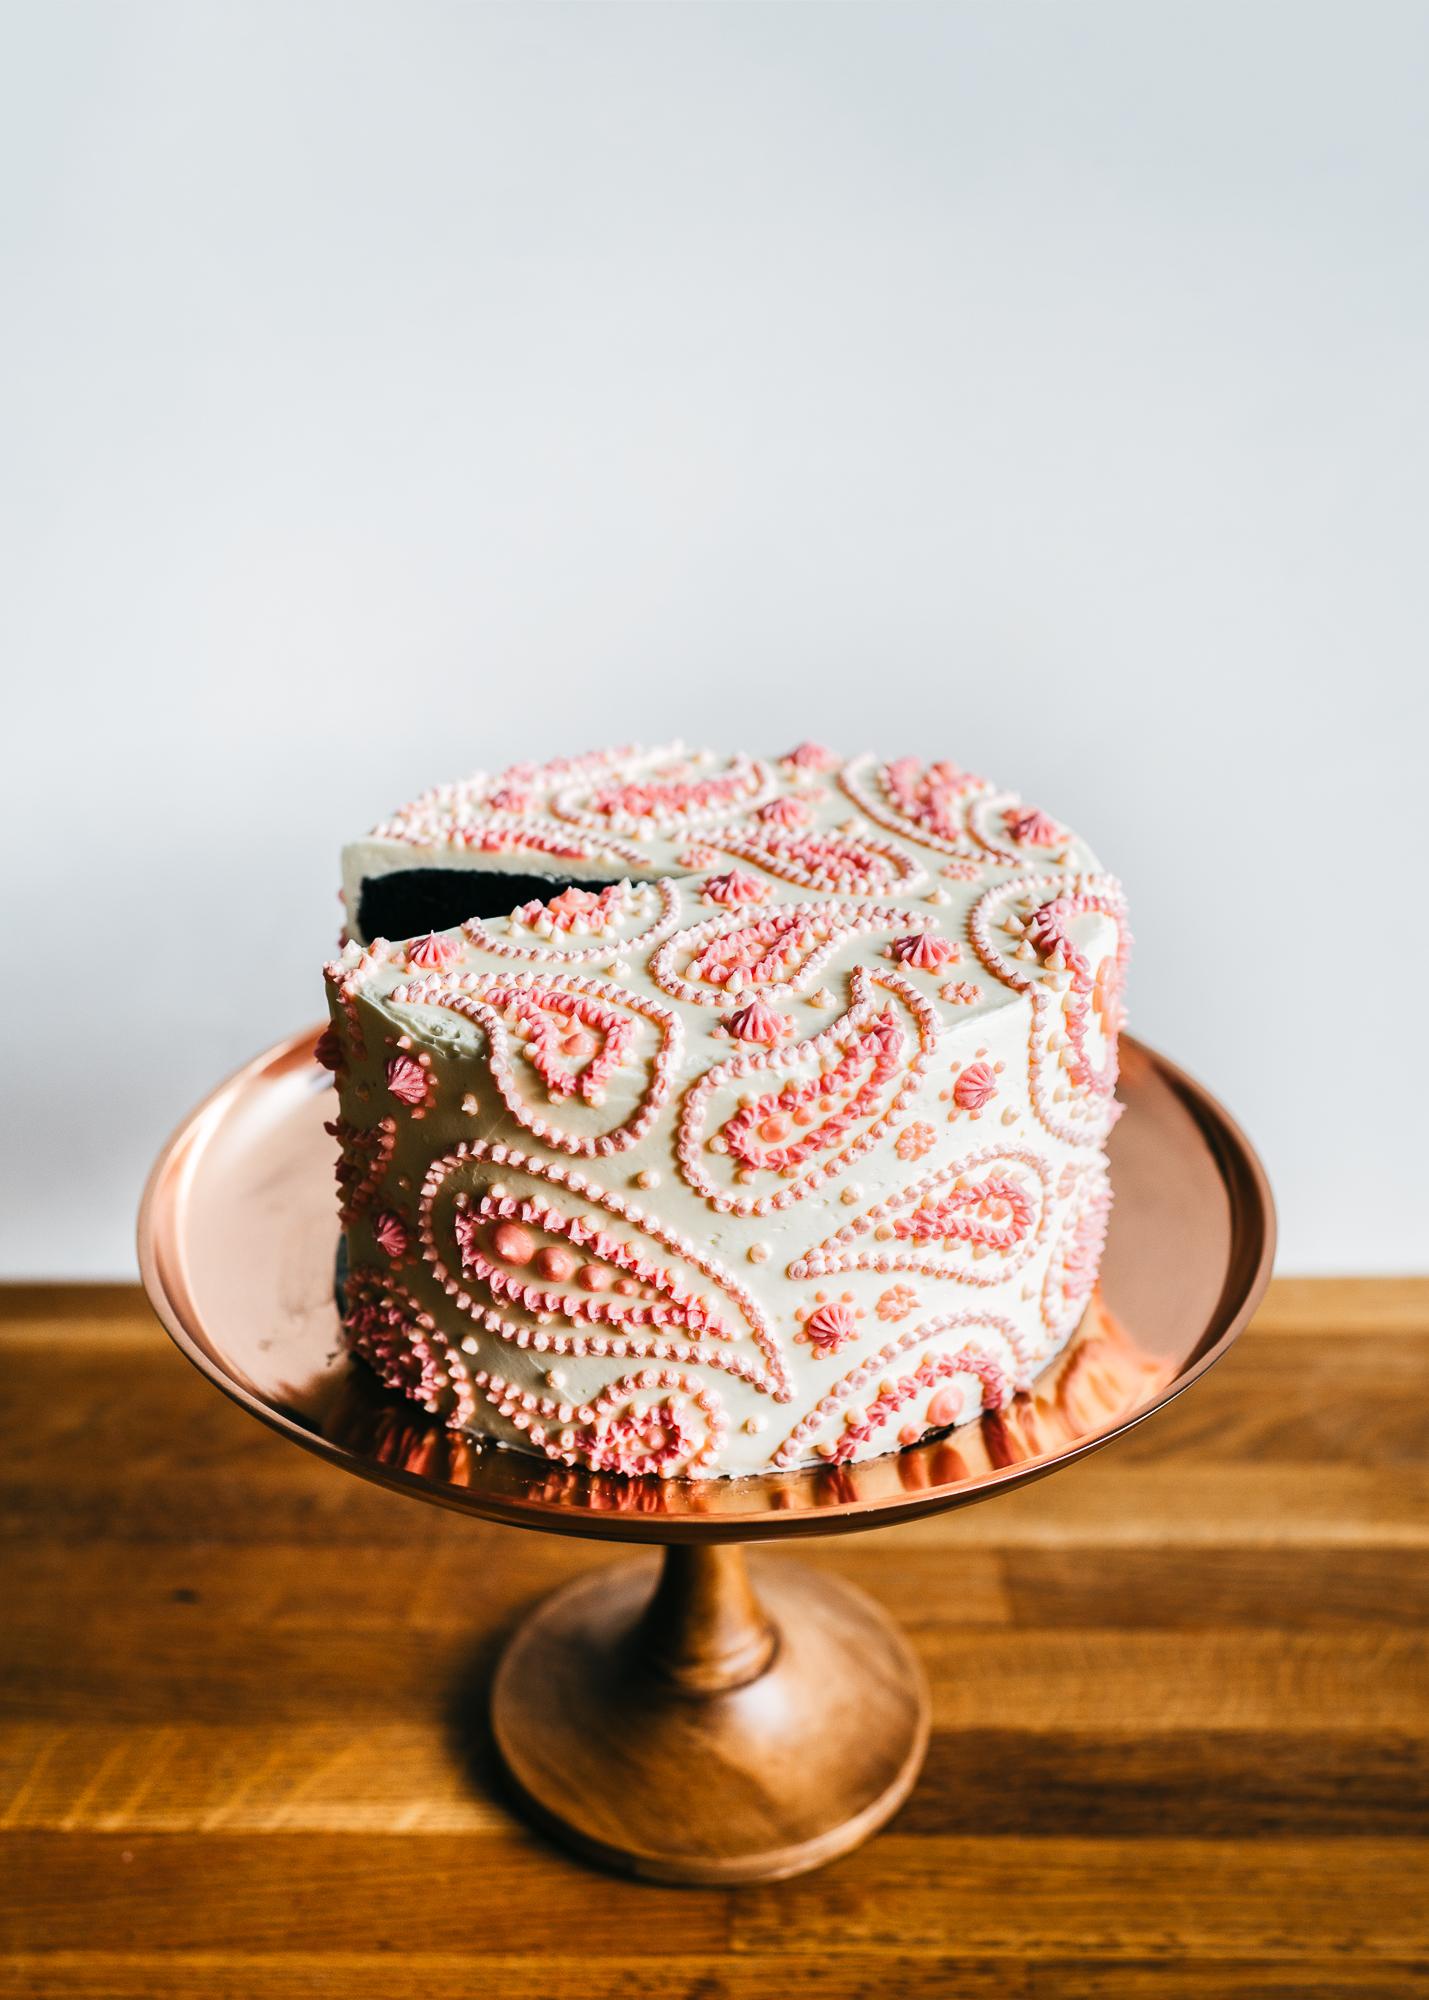 chocolate-coconut-cake-11.jpg